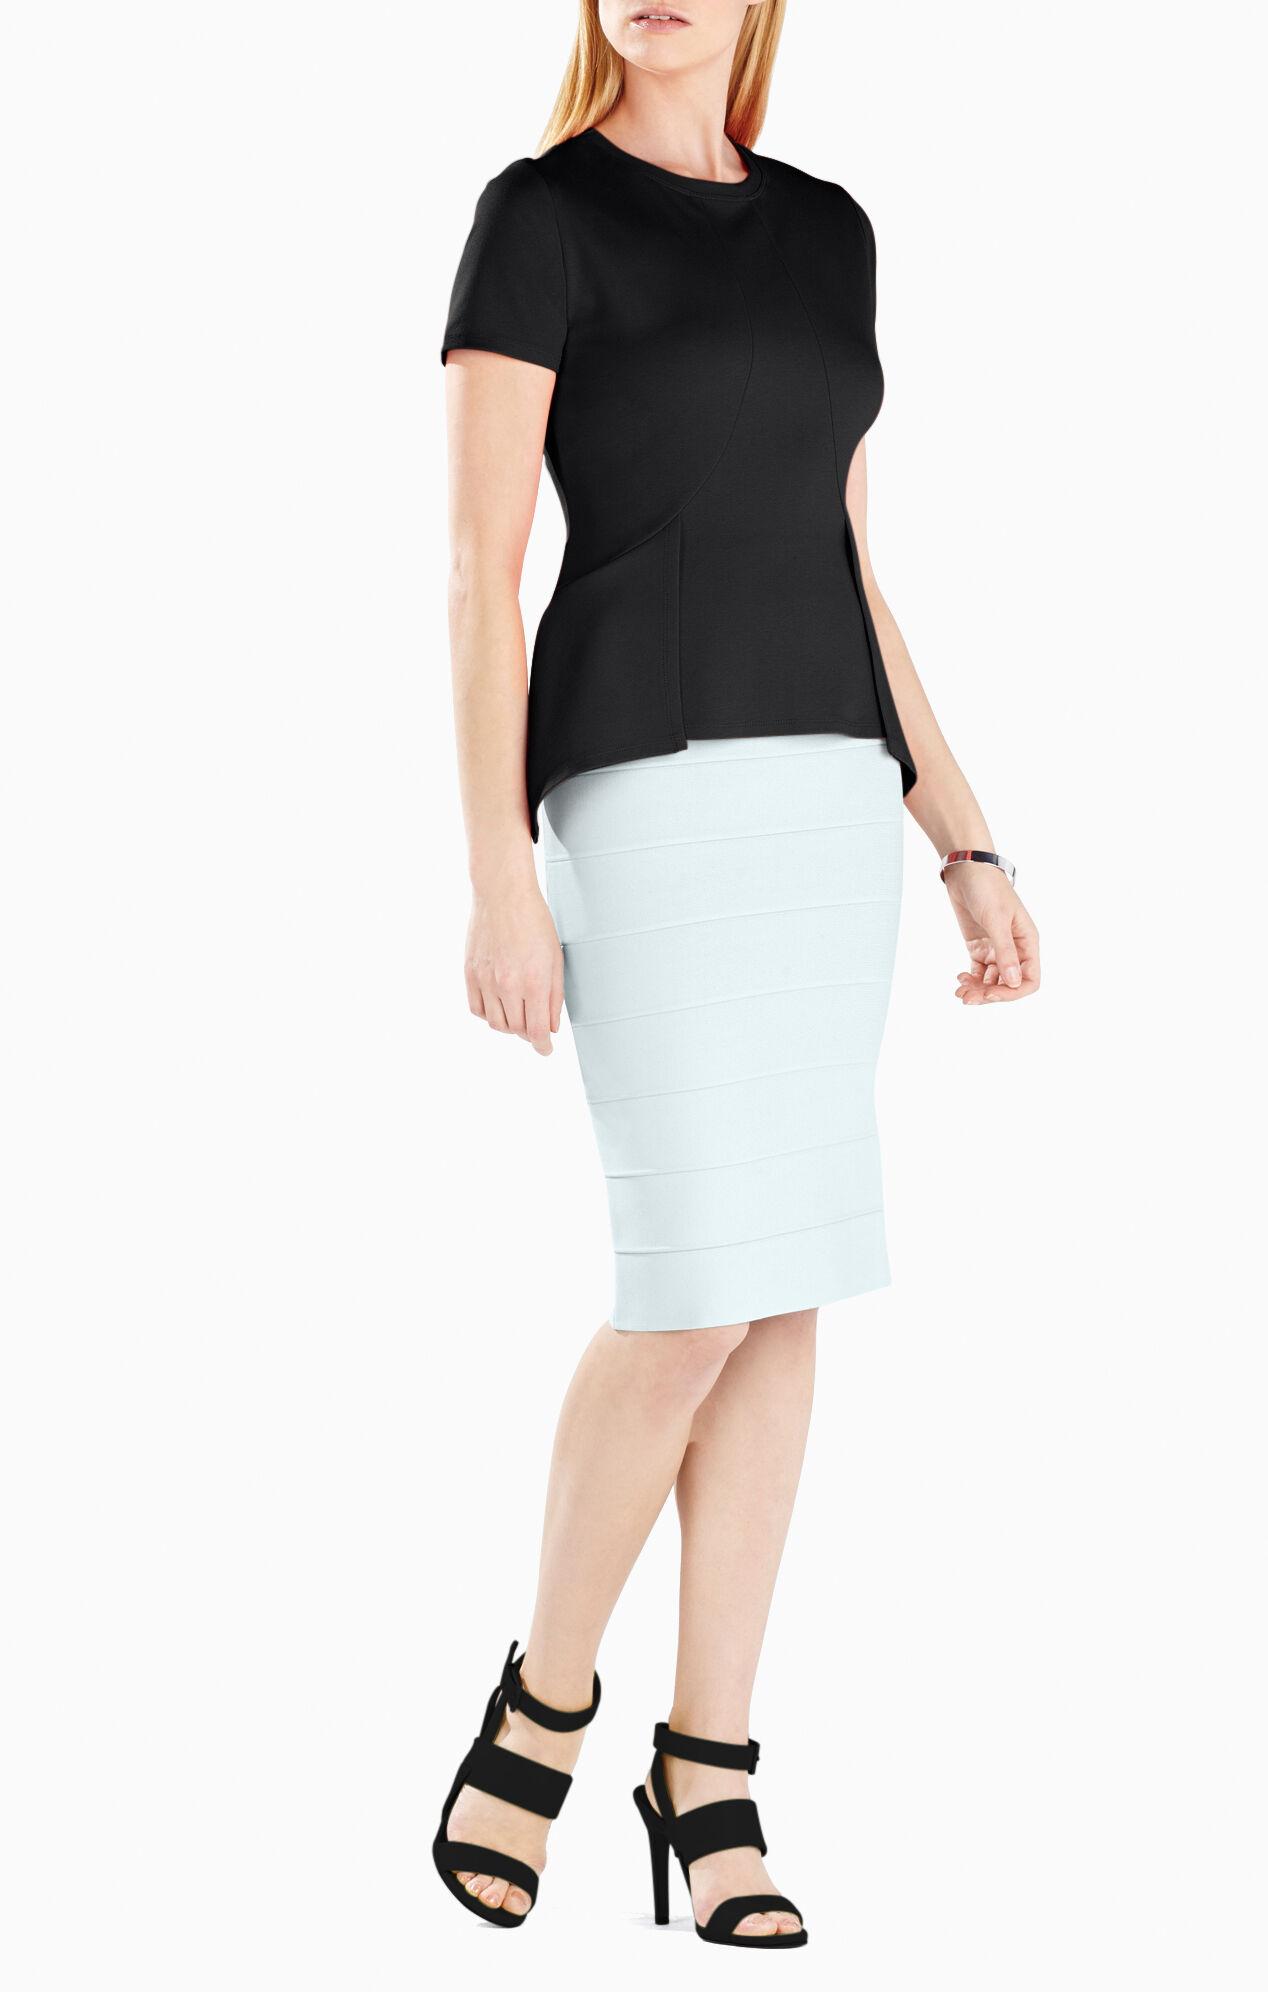 Scarlet Short-Sleeve Peplum Top